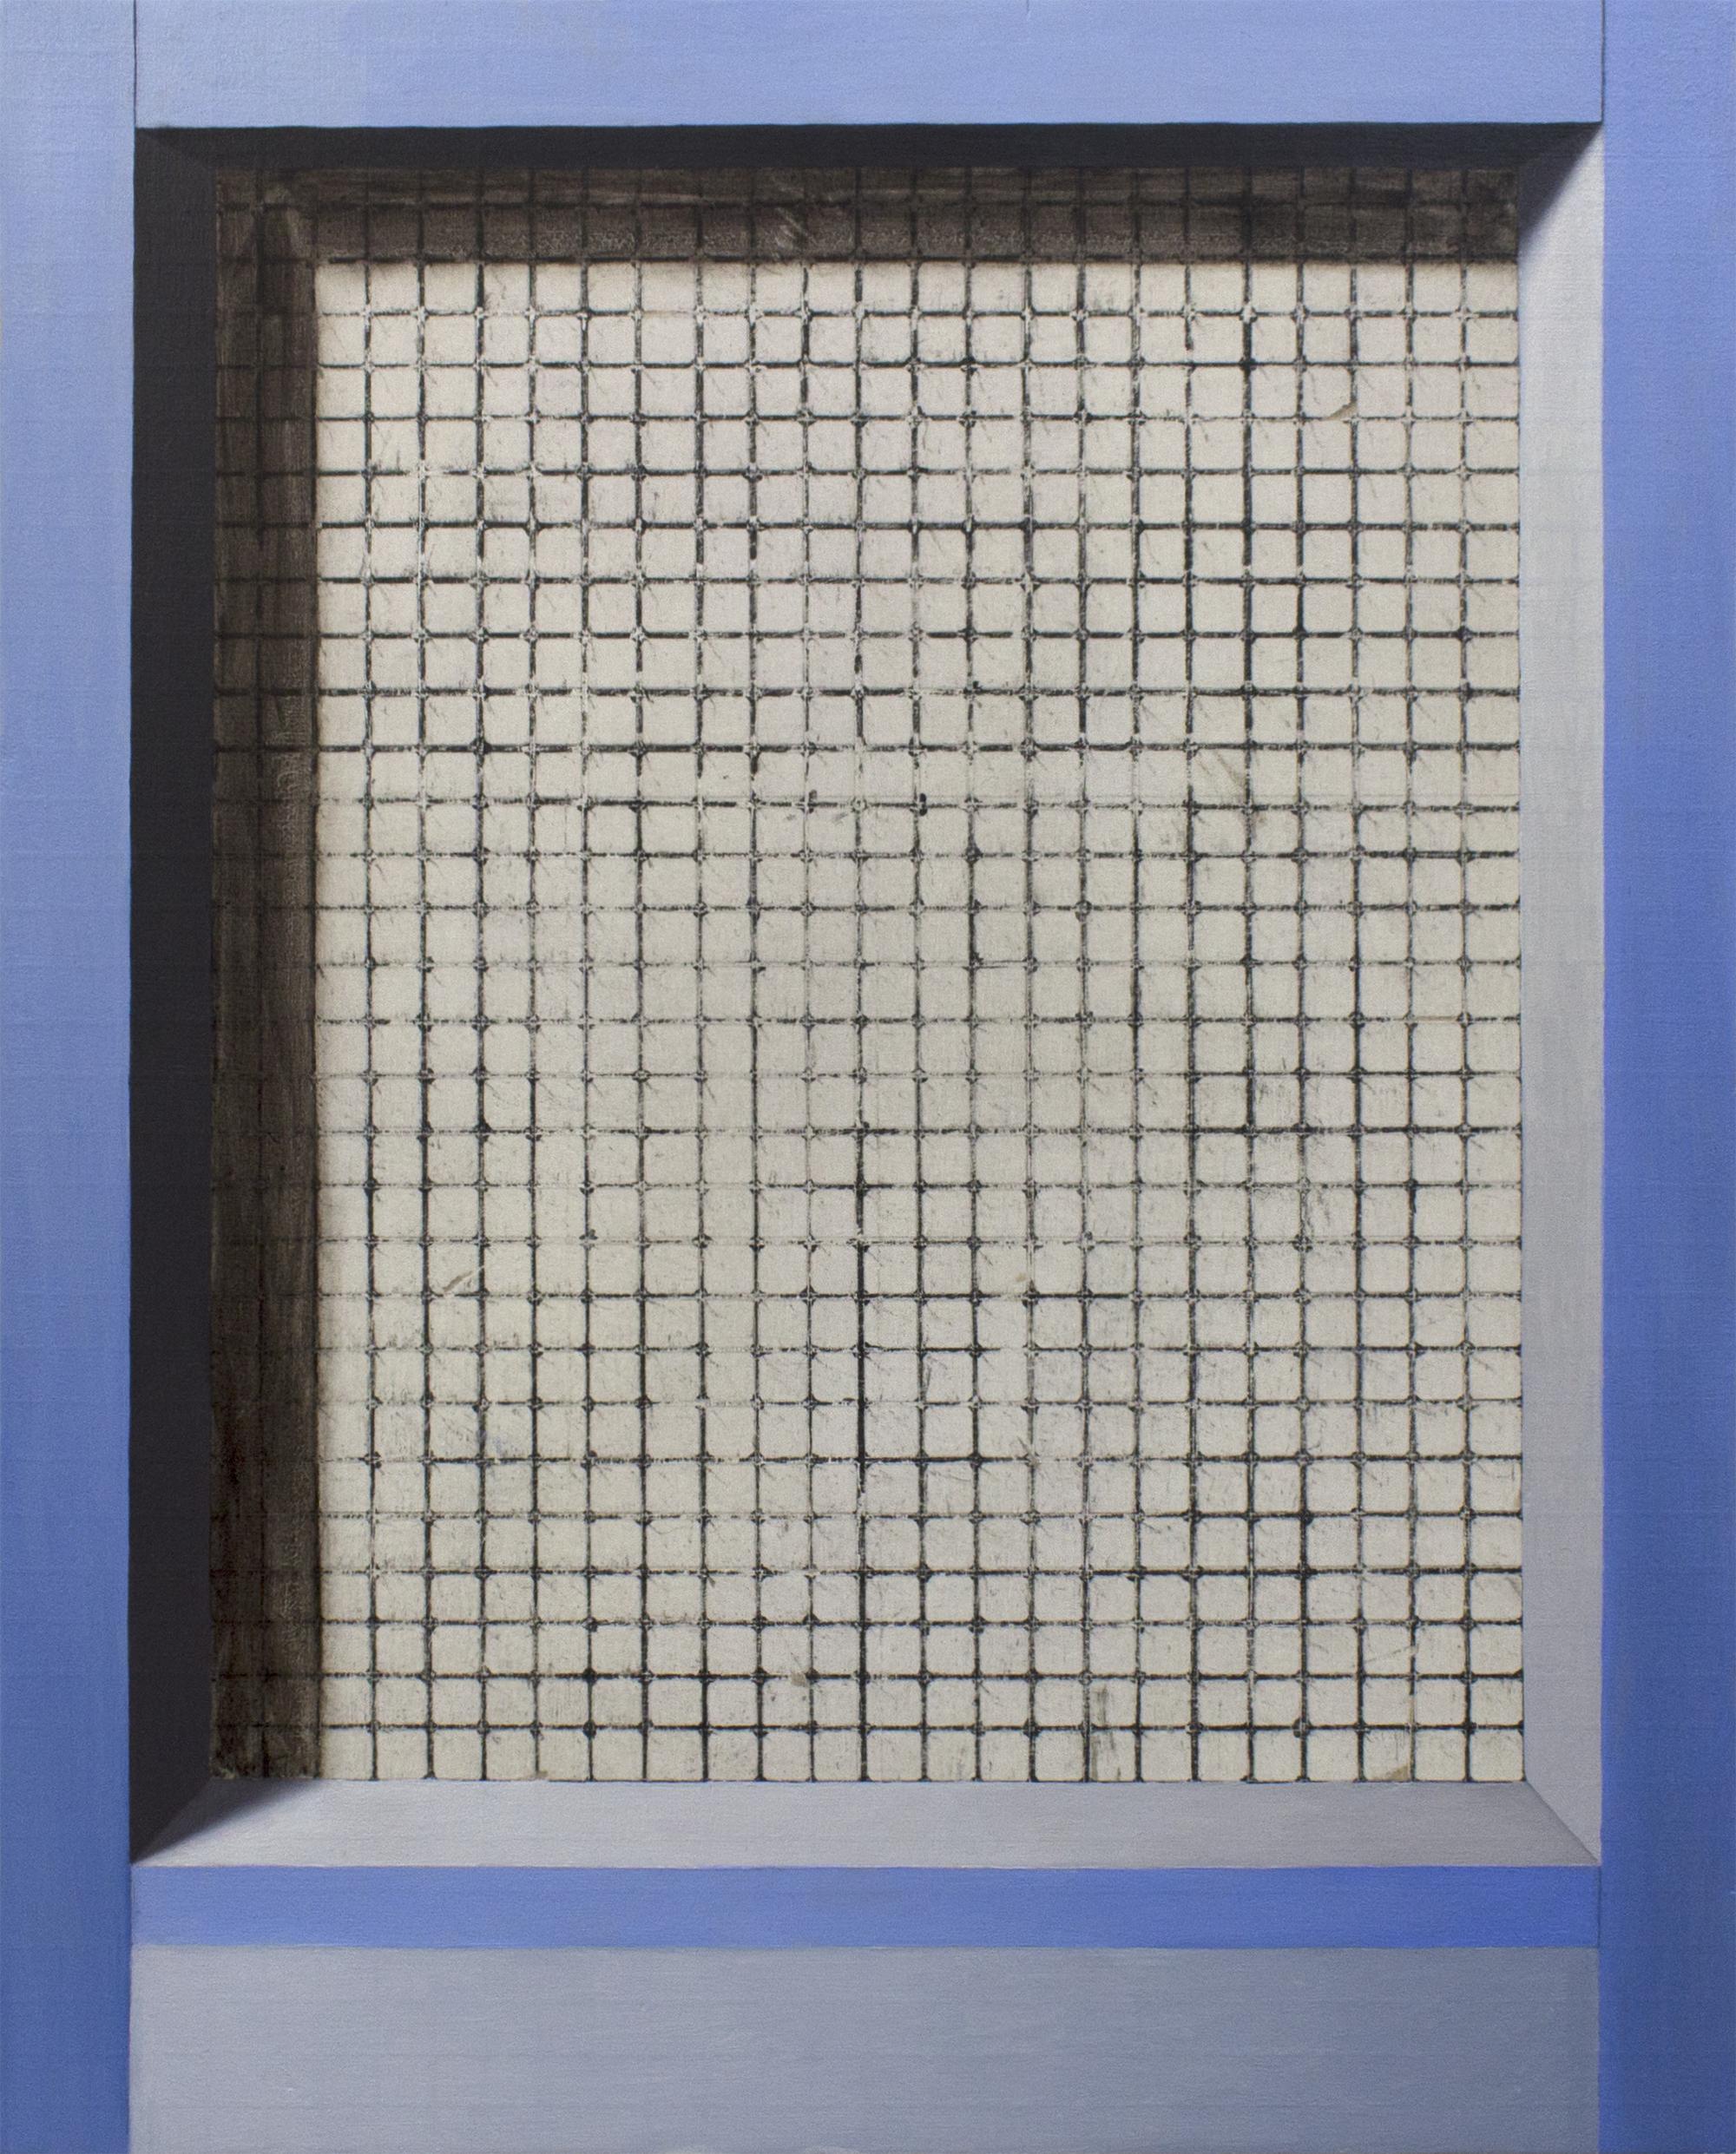 Threshold (Tile)  2018  Oil on wood panel  10 x 8 in